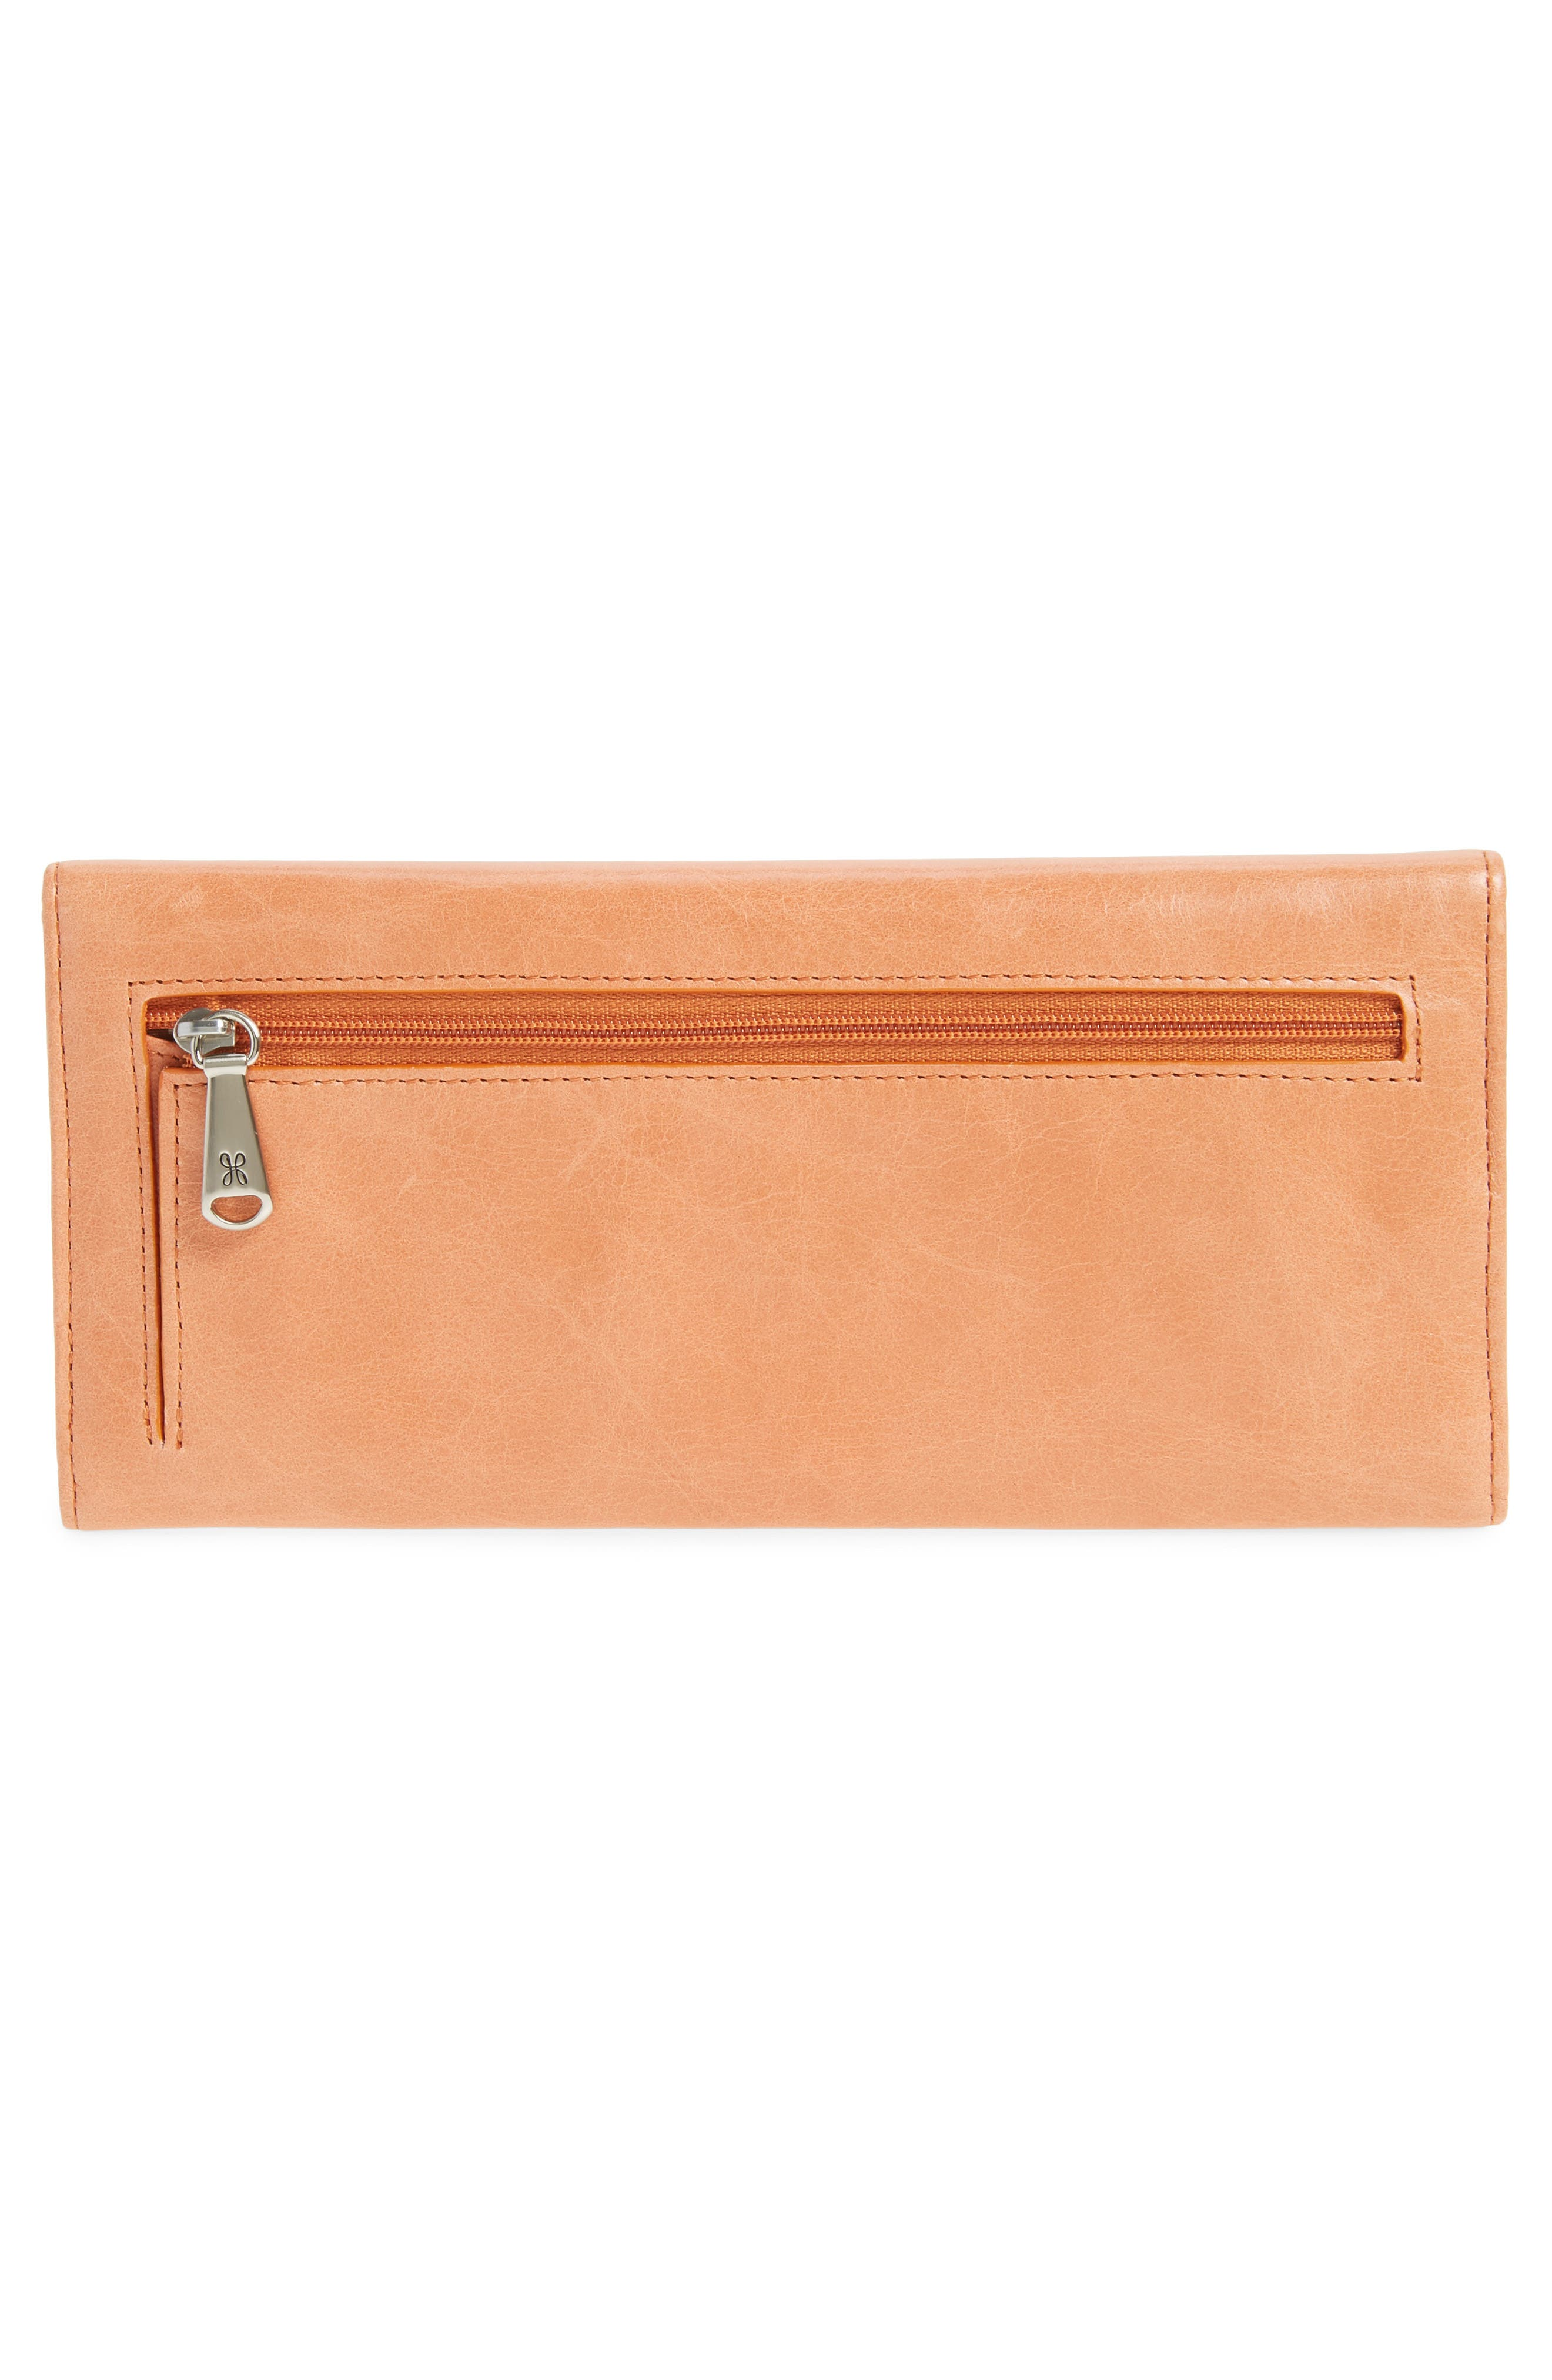 'Sadie' Leather Wallet,                             Alternate thumbnail 112, color,